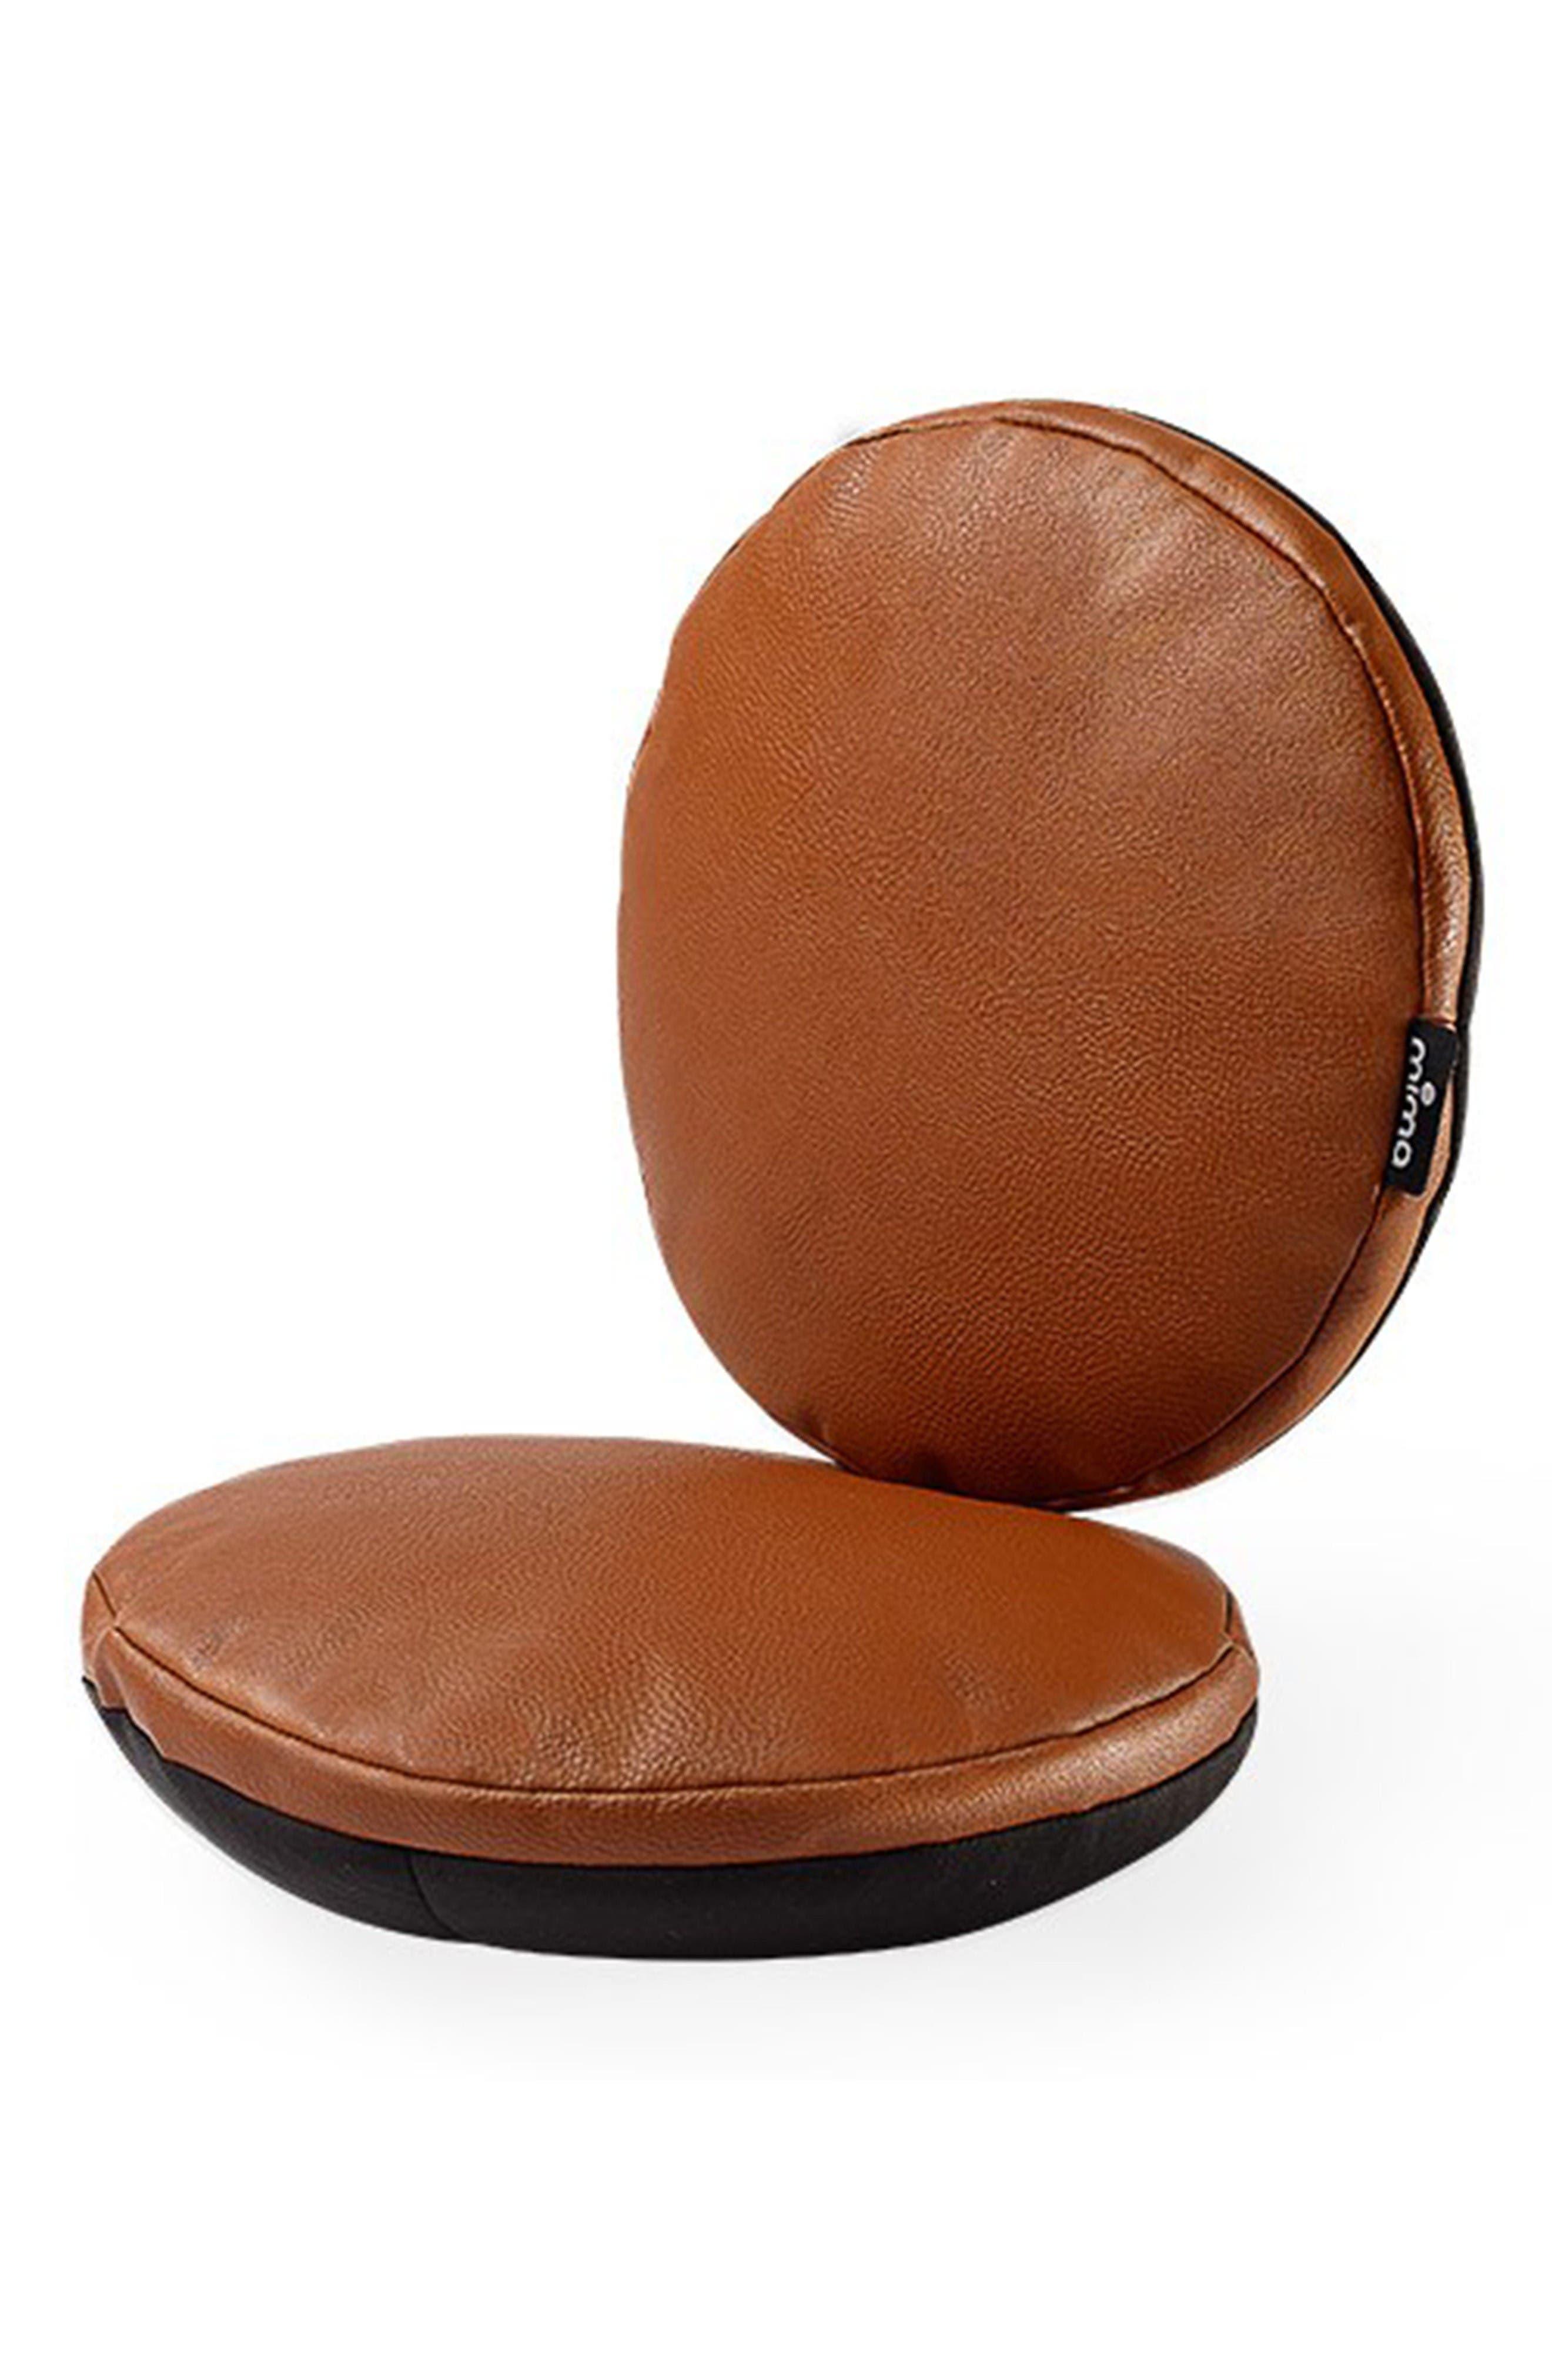 Main Image - Mima Moon Junior Highchair Seat Cushion